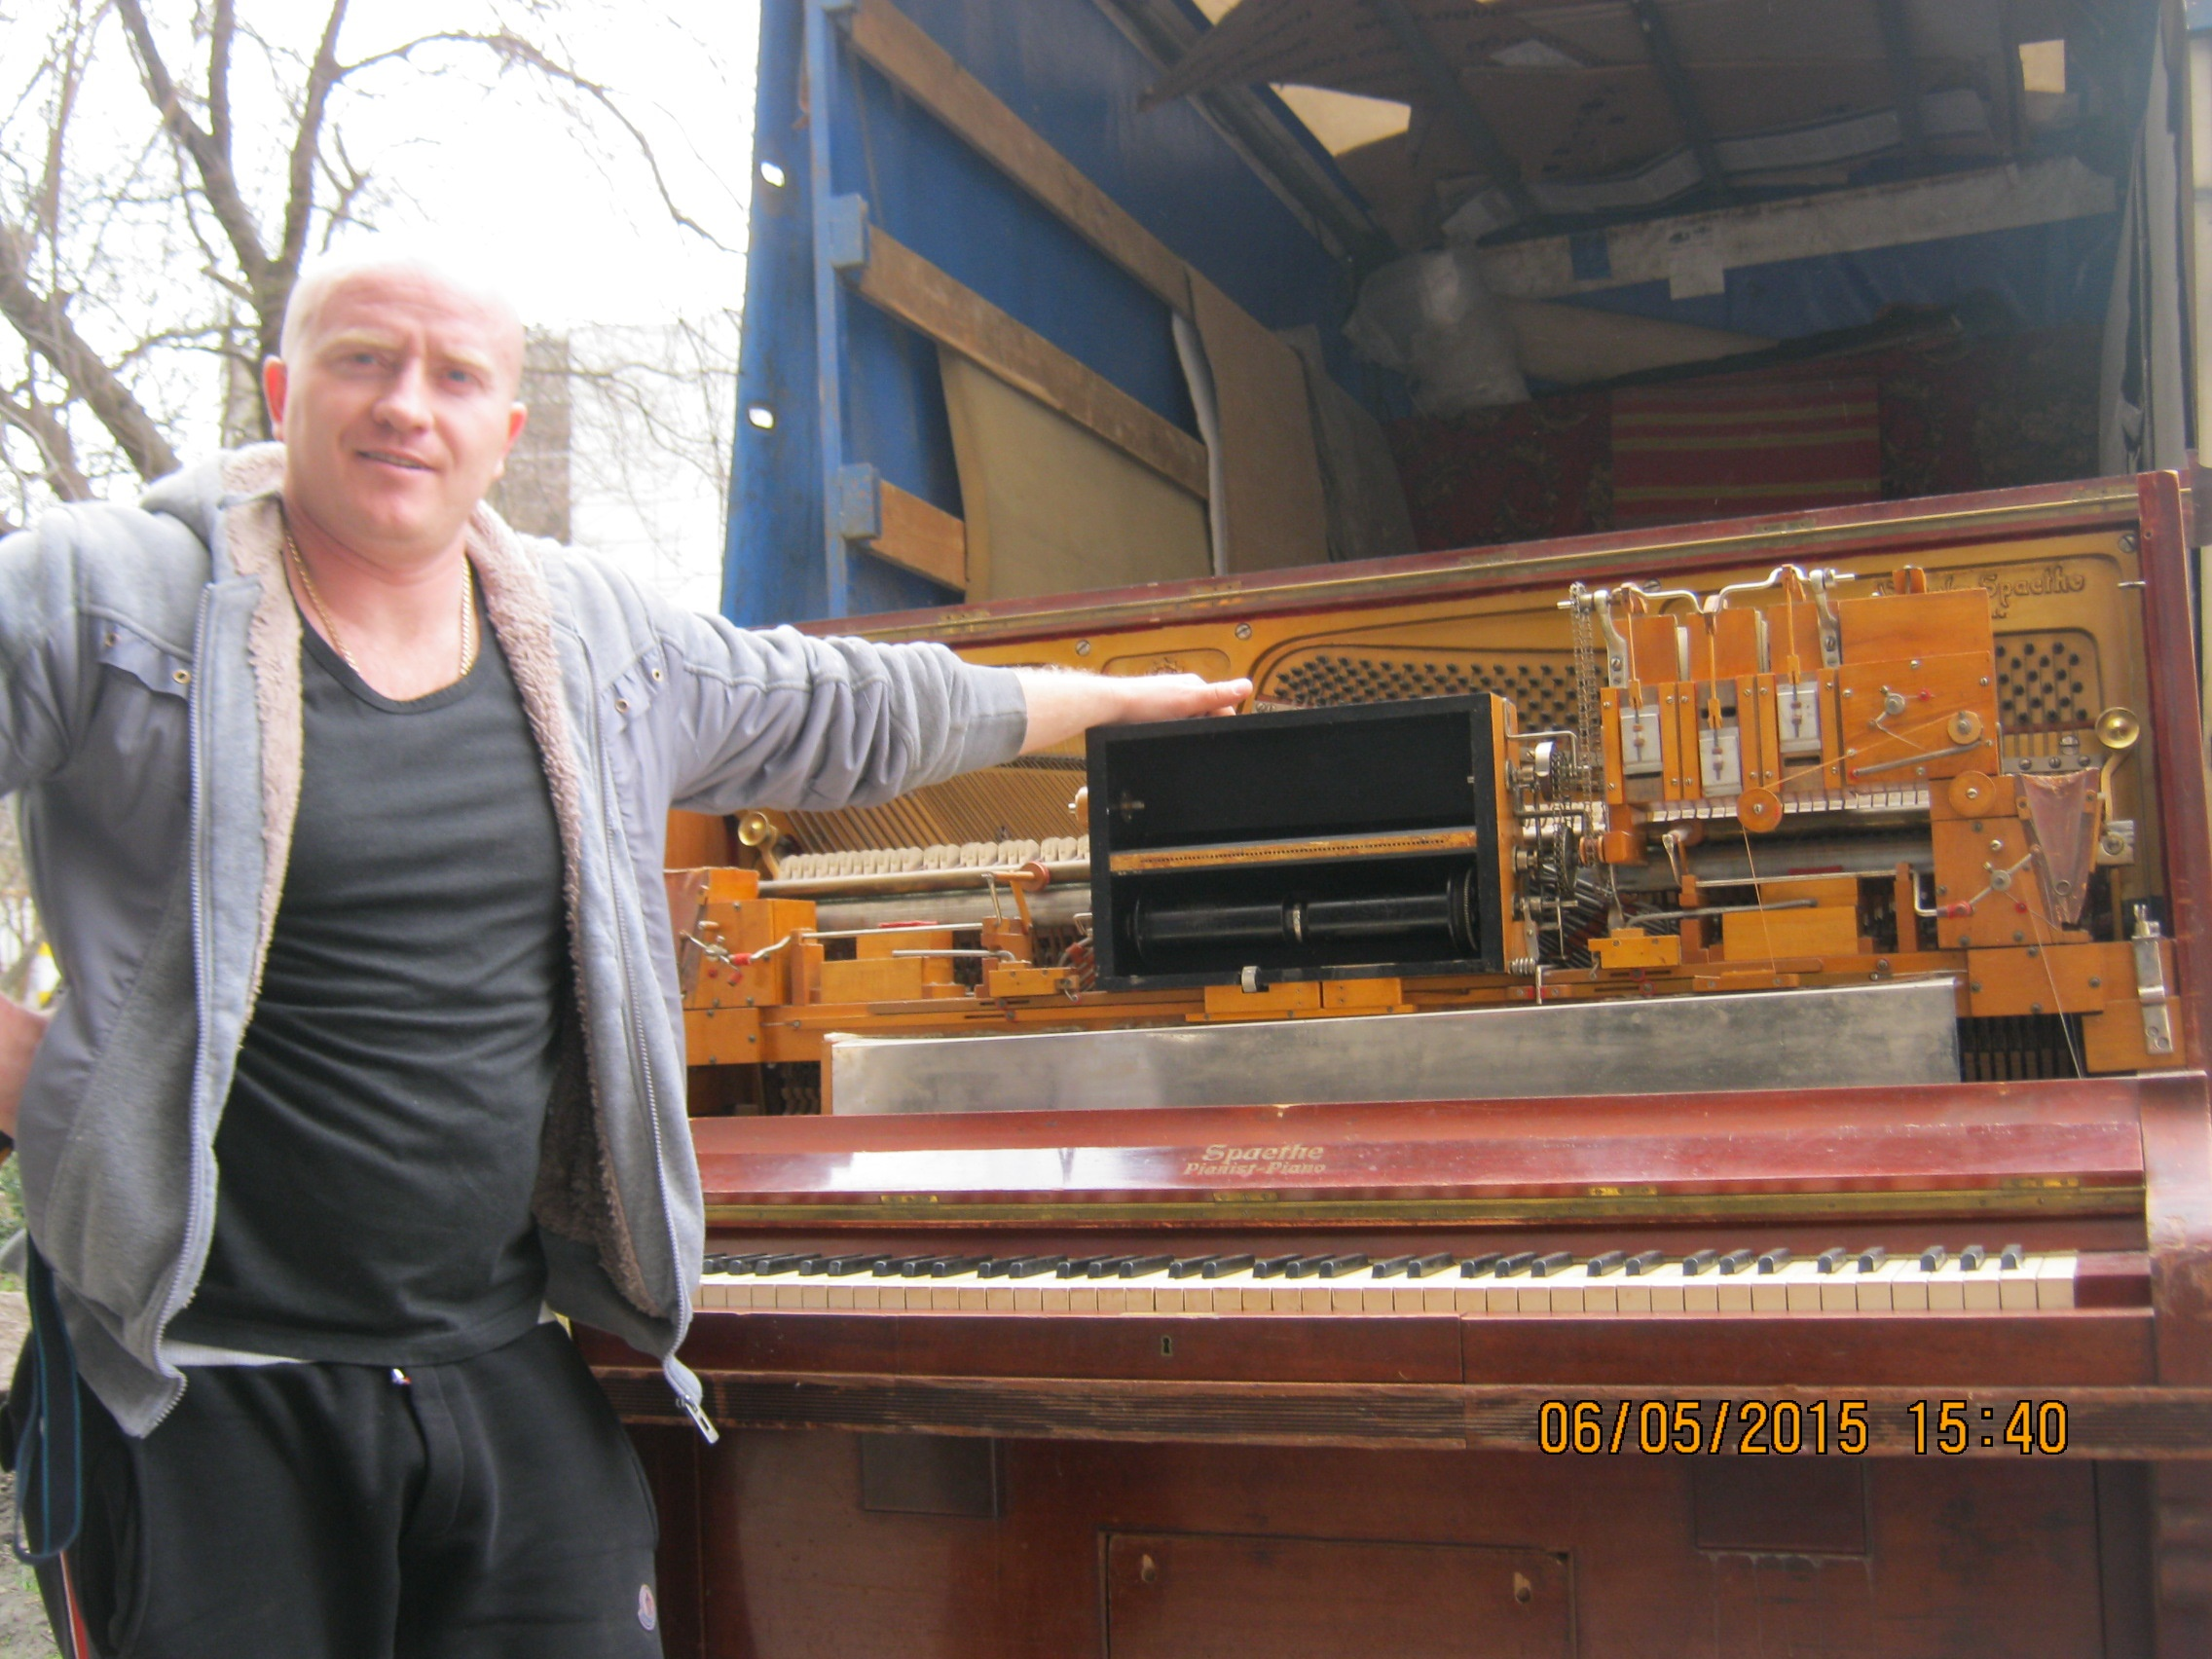 Перевозка пианино Wilhelm Spaethe и история инструмента